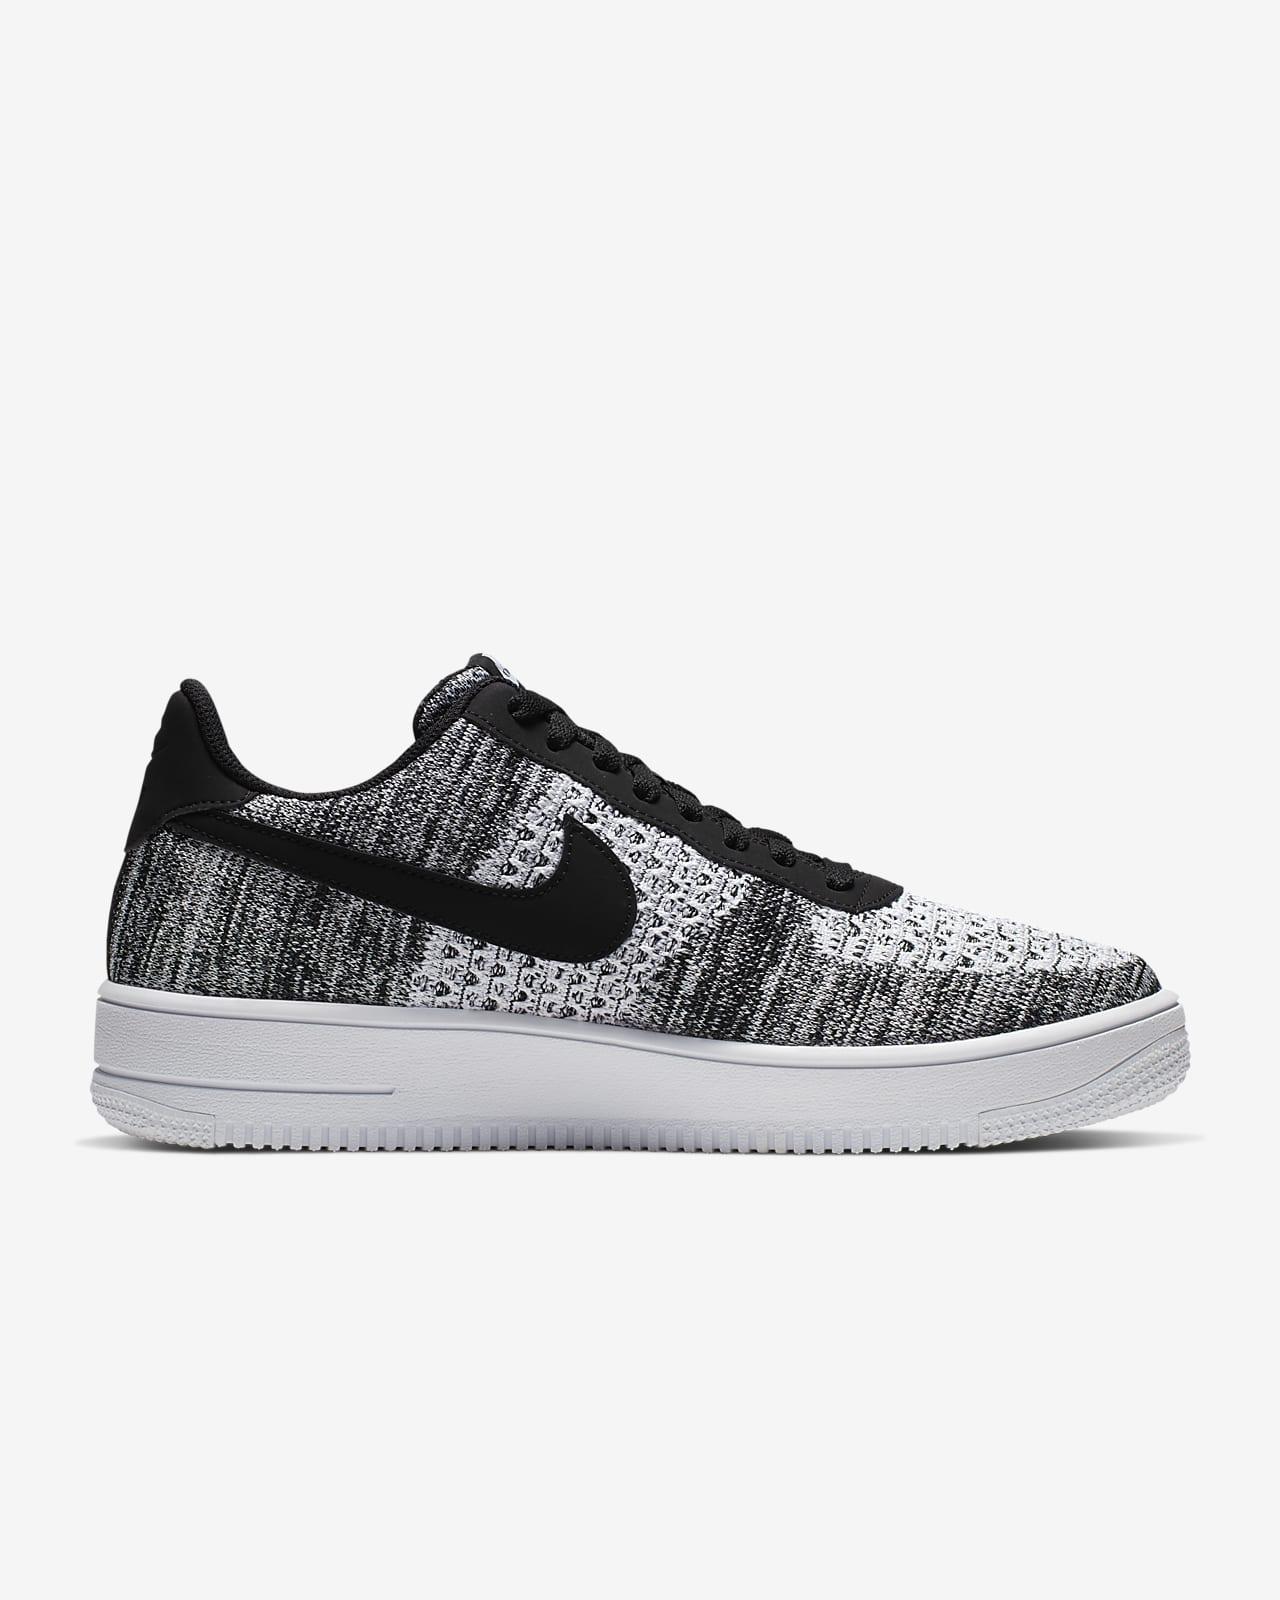 Nike Air Force 1 Flyknit 2.0 Shoe. Nike NZ